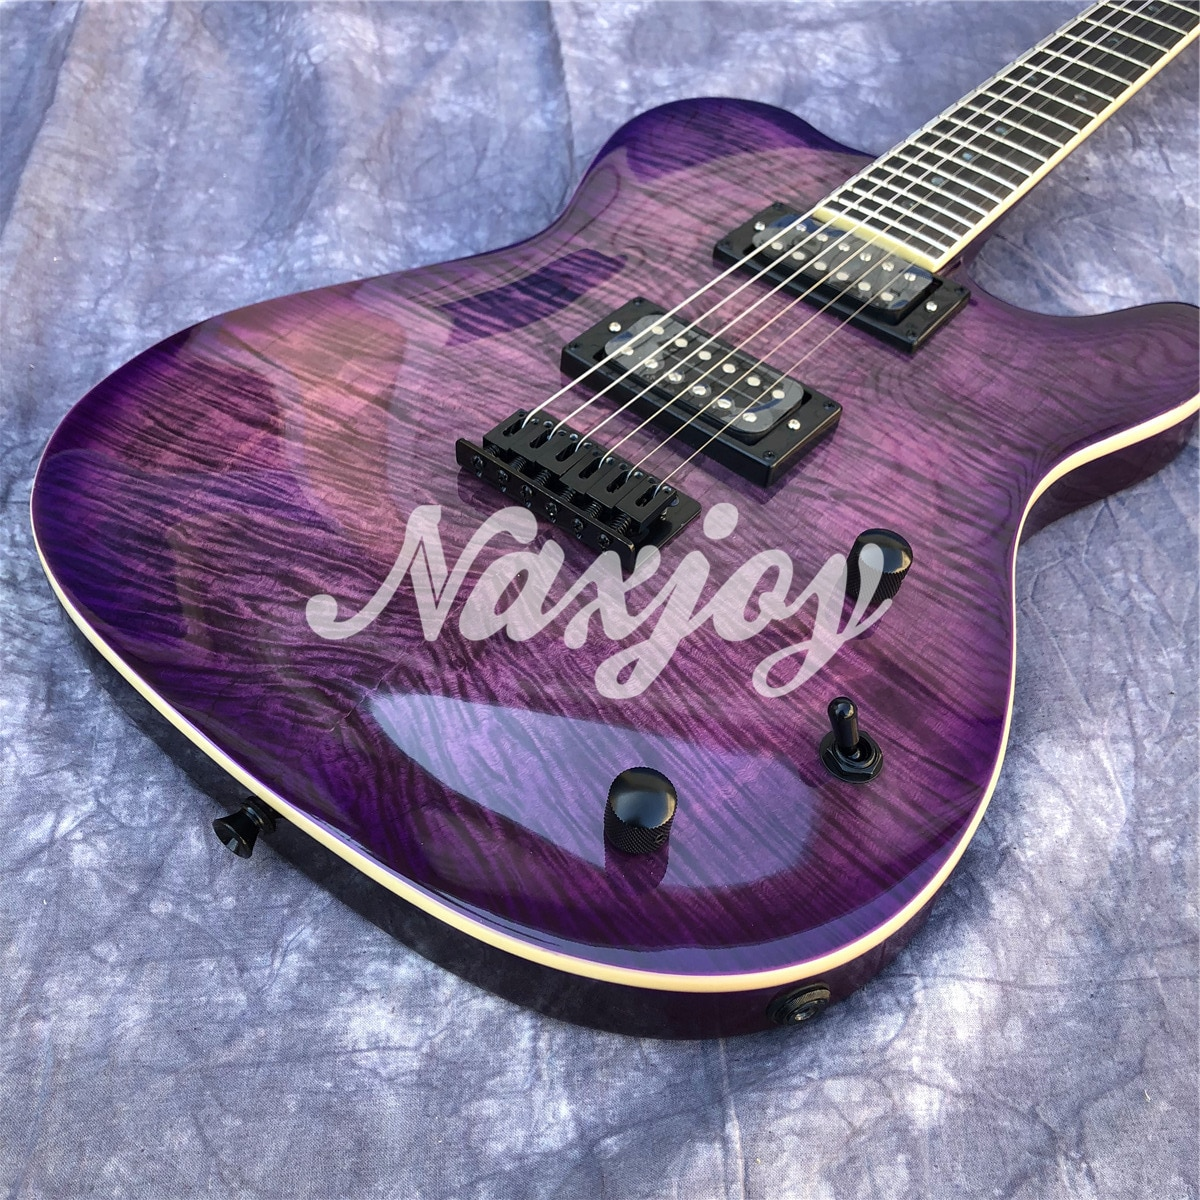 Purple Flame Maple Top TL Electric Guitar Rosewood Fingerboard Solid Wood Body 6 Strings Guitarra enlarge